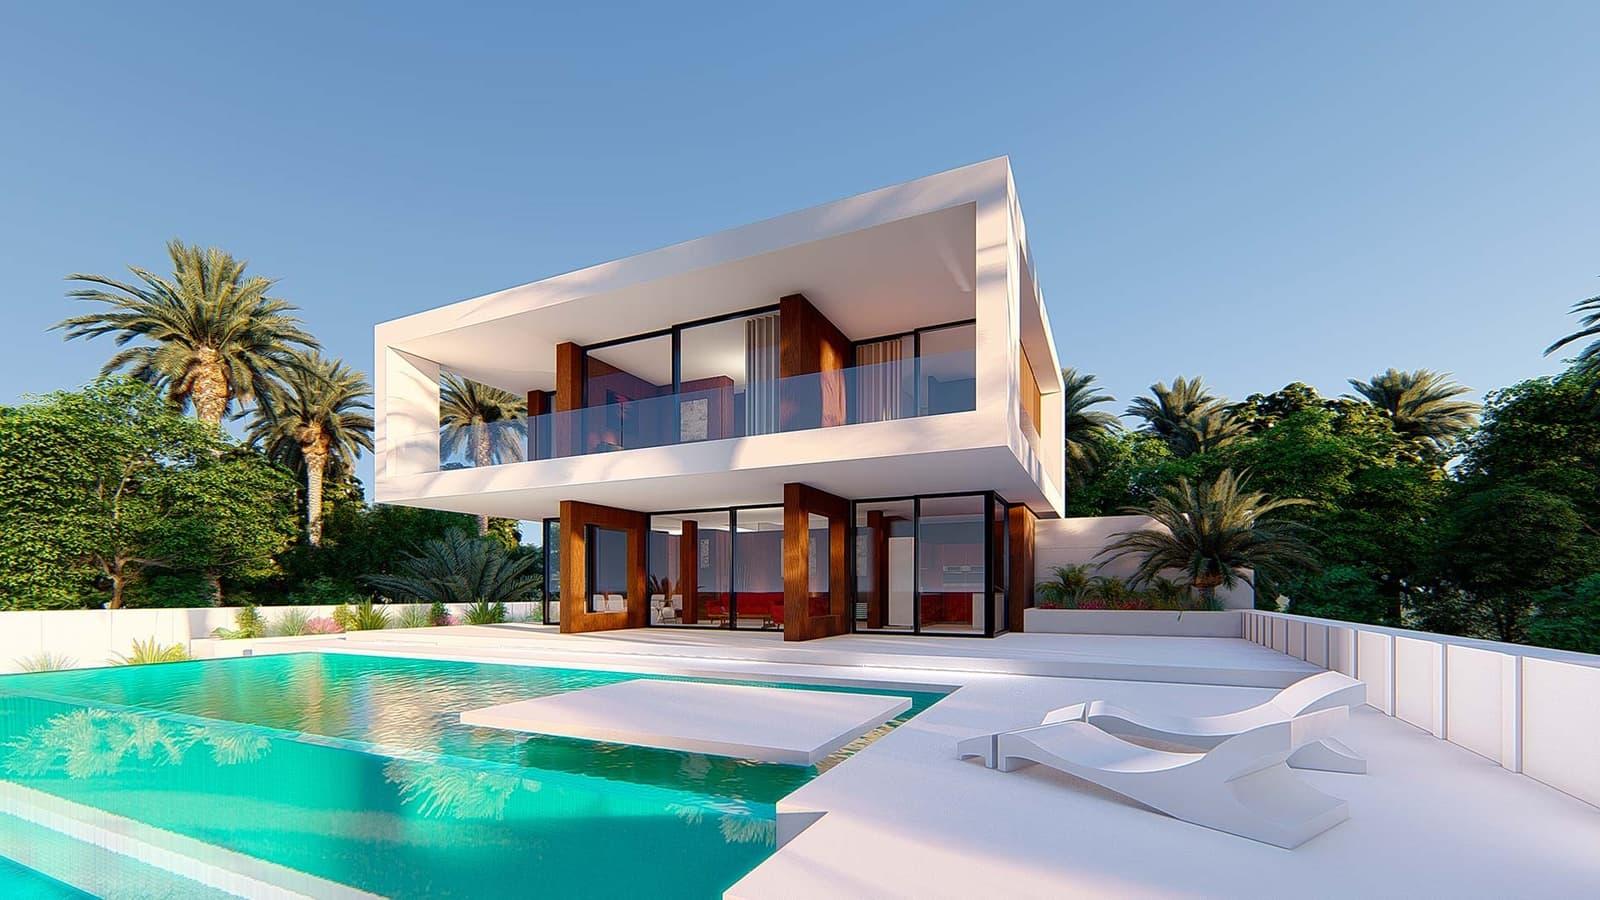 3 bedroom Villa for sale in Estepona with pool - € 650,000 (Ref: 5503740)